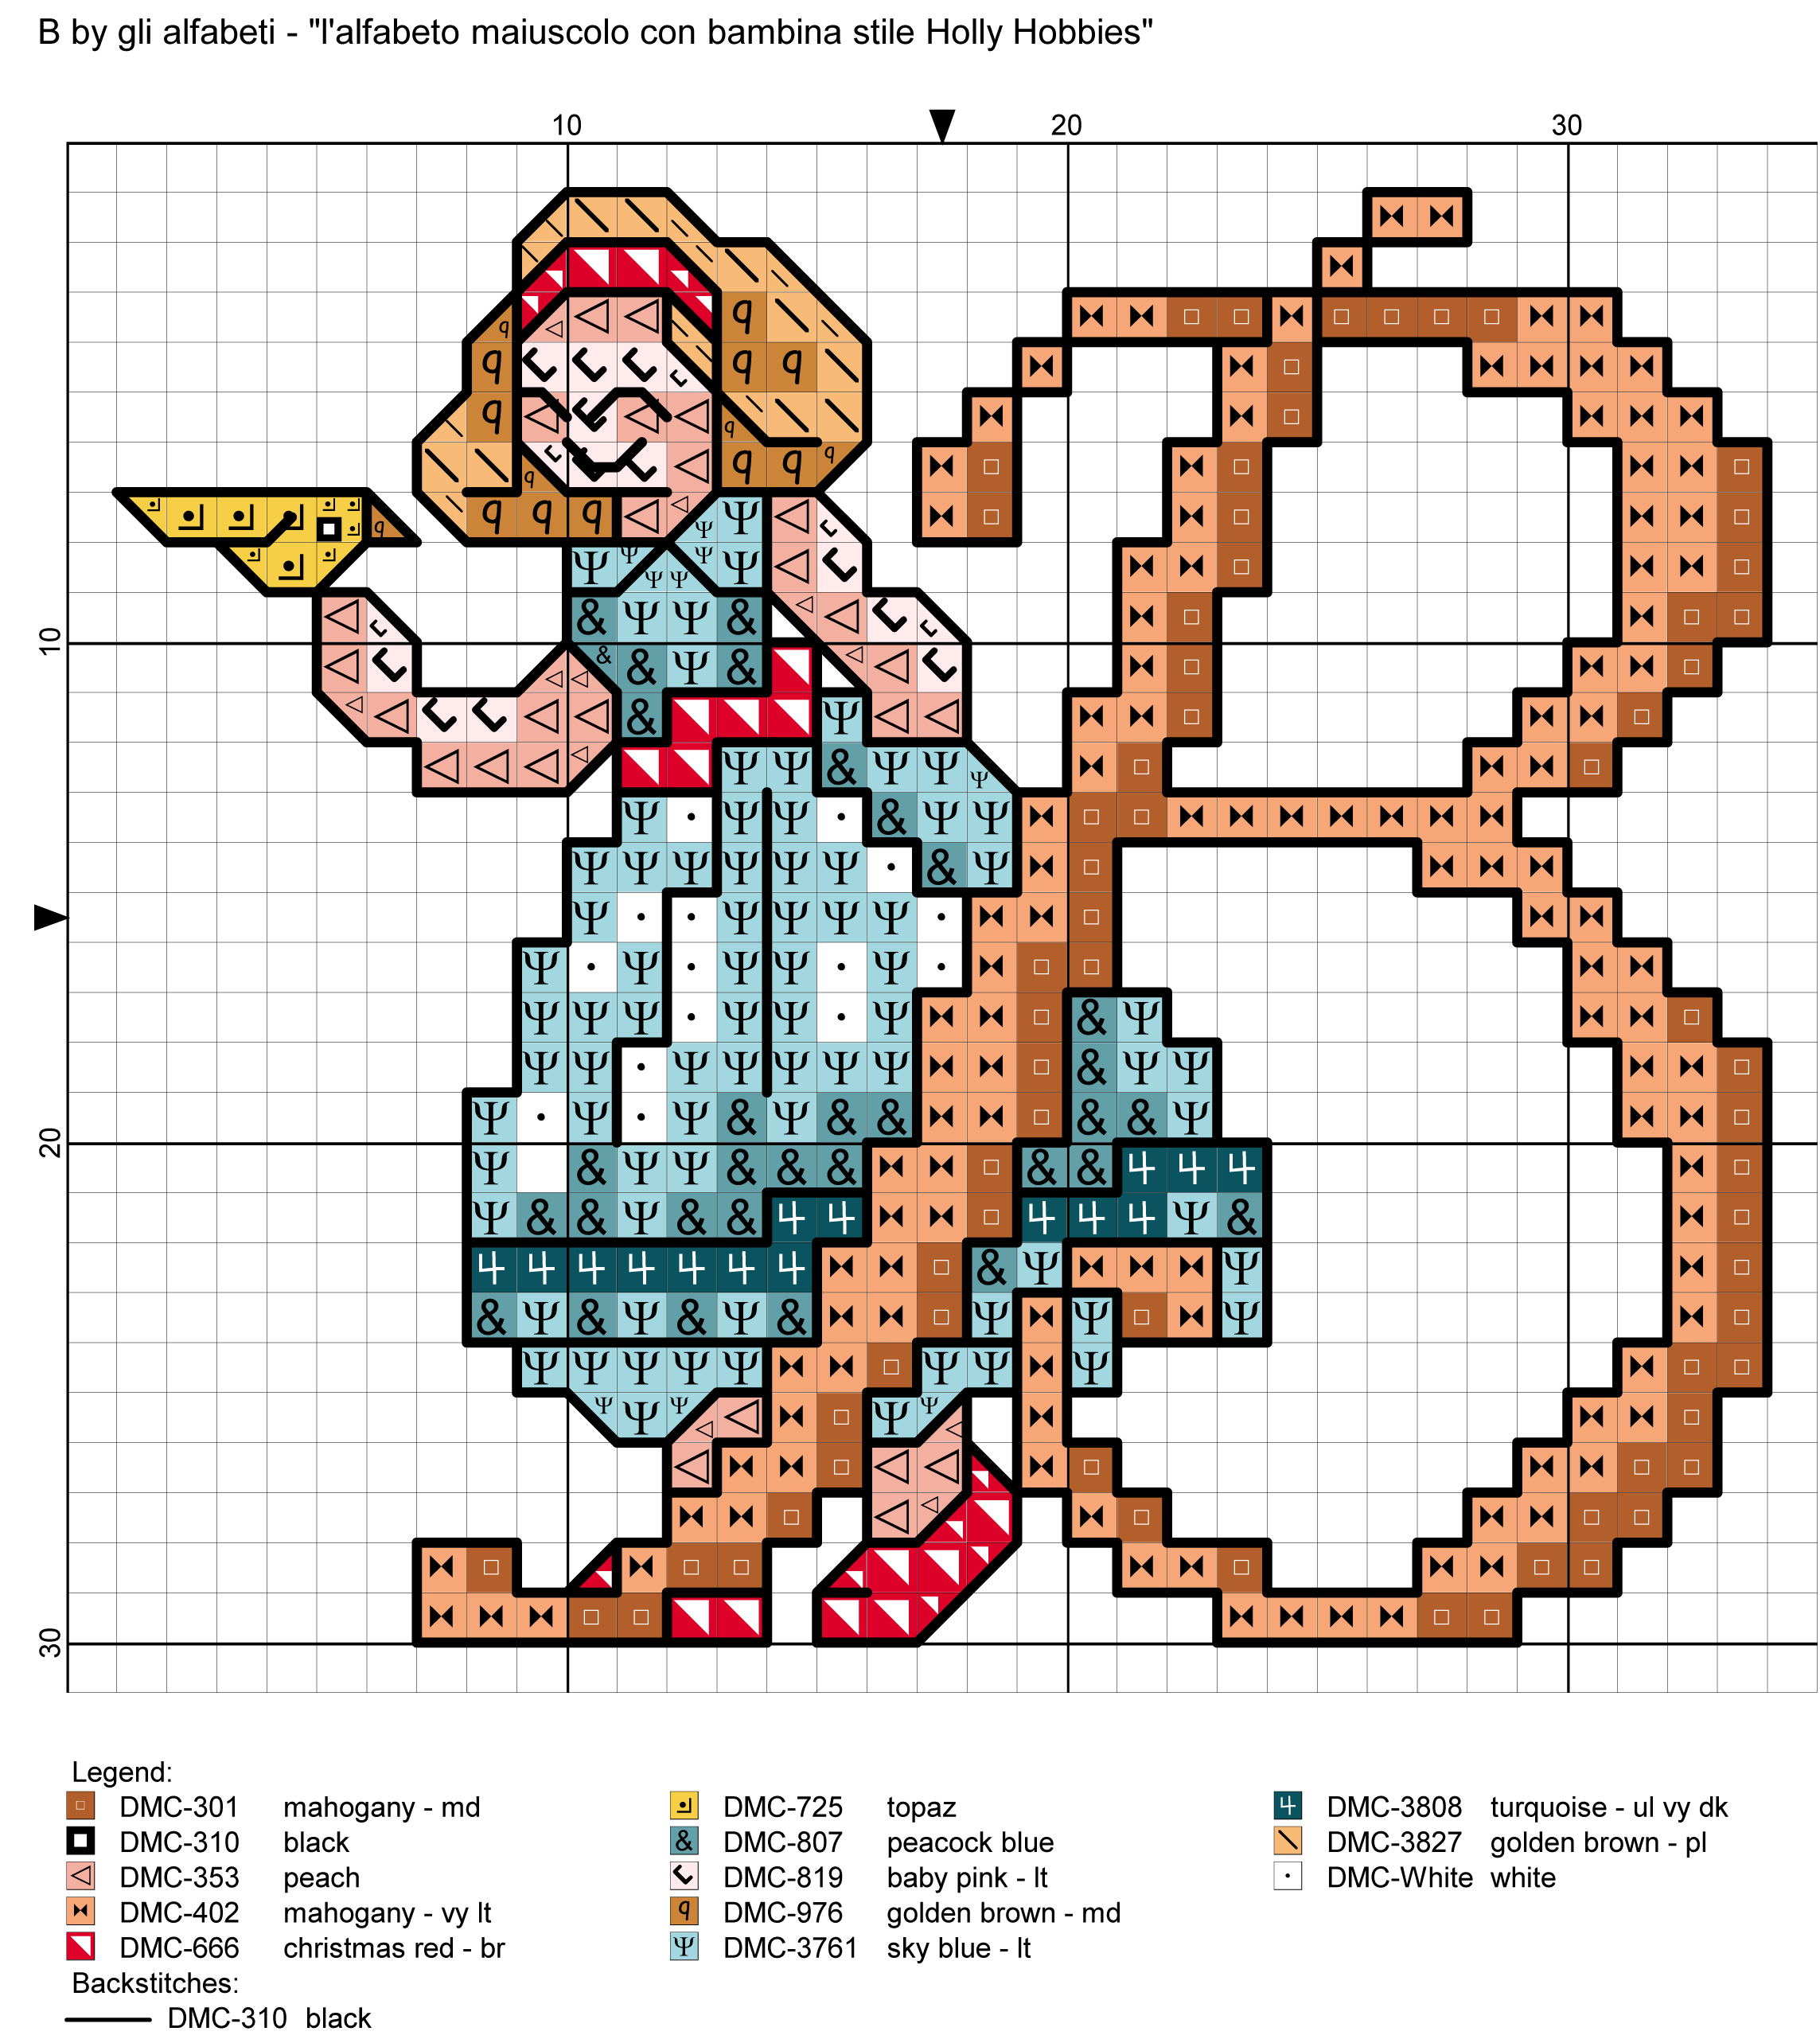 Alfabeto maiuscolo con bambina stile holly hobbies b for Lettere a punto a croce